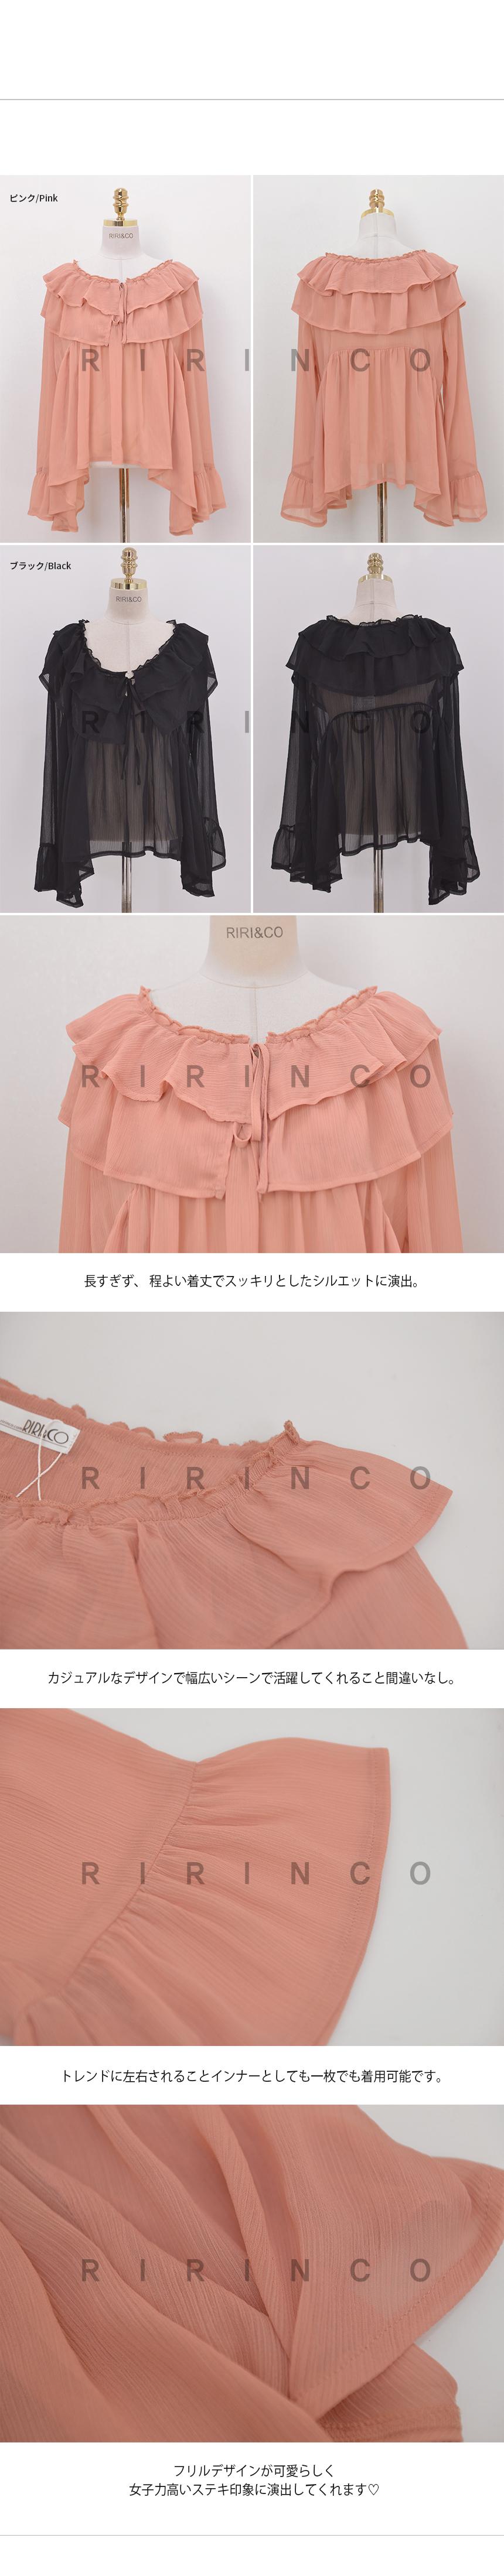 RIRINCO 丸襟 フリルリボンブラウス